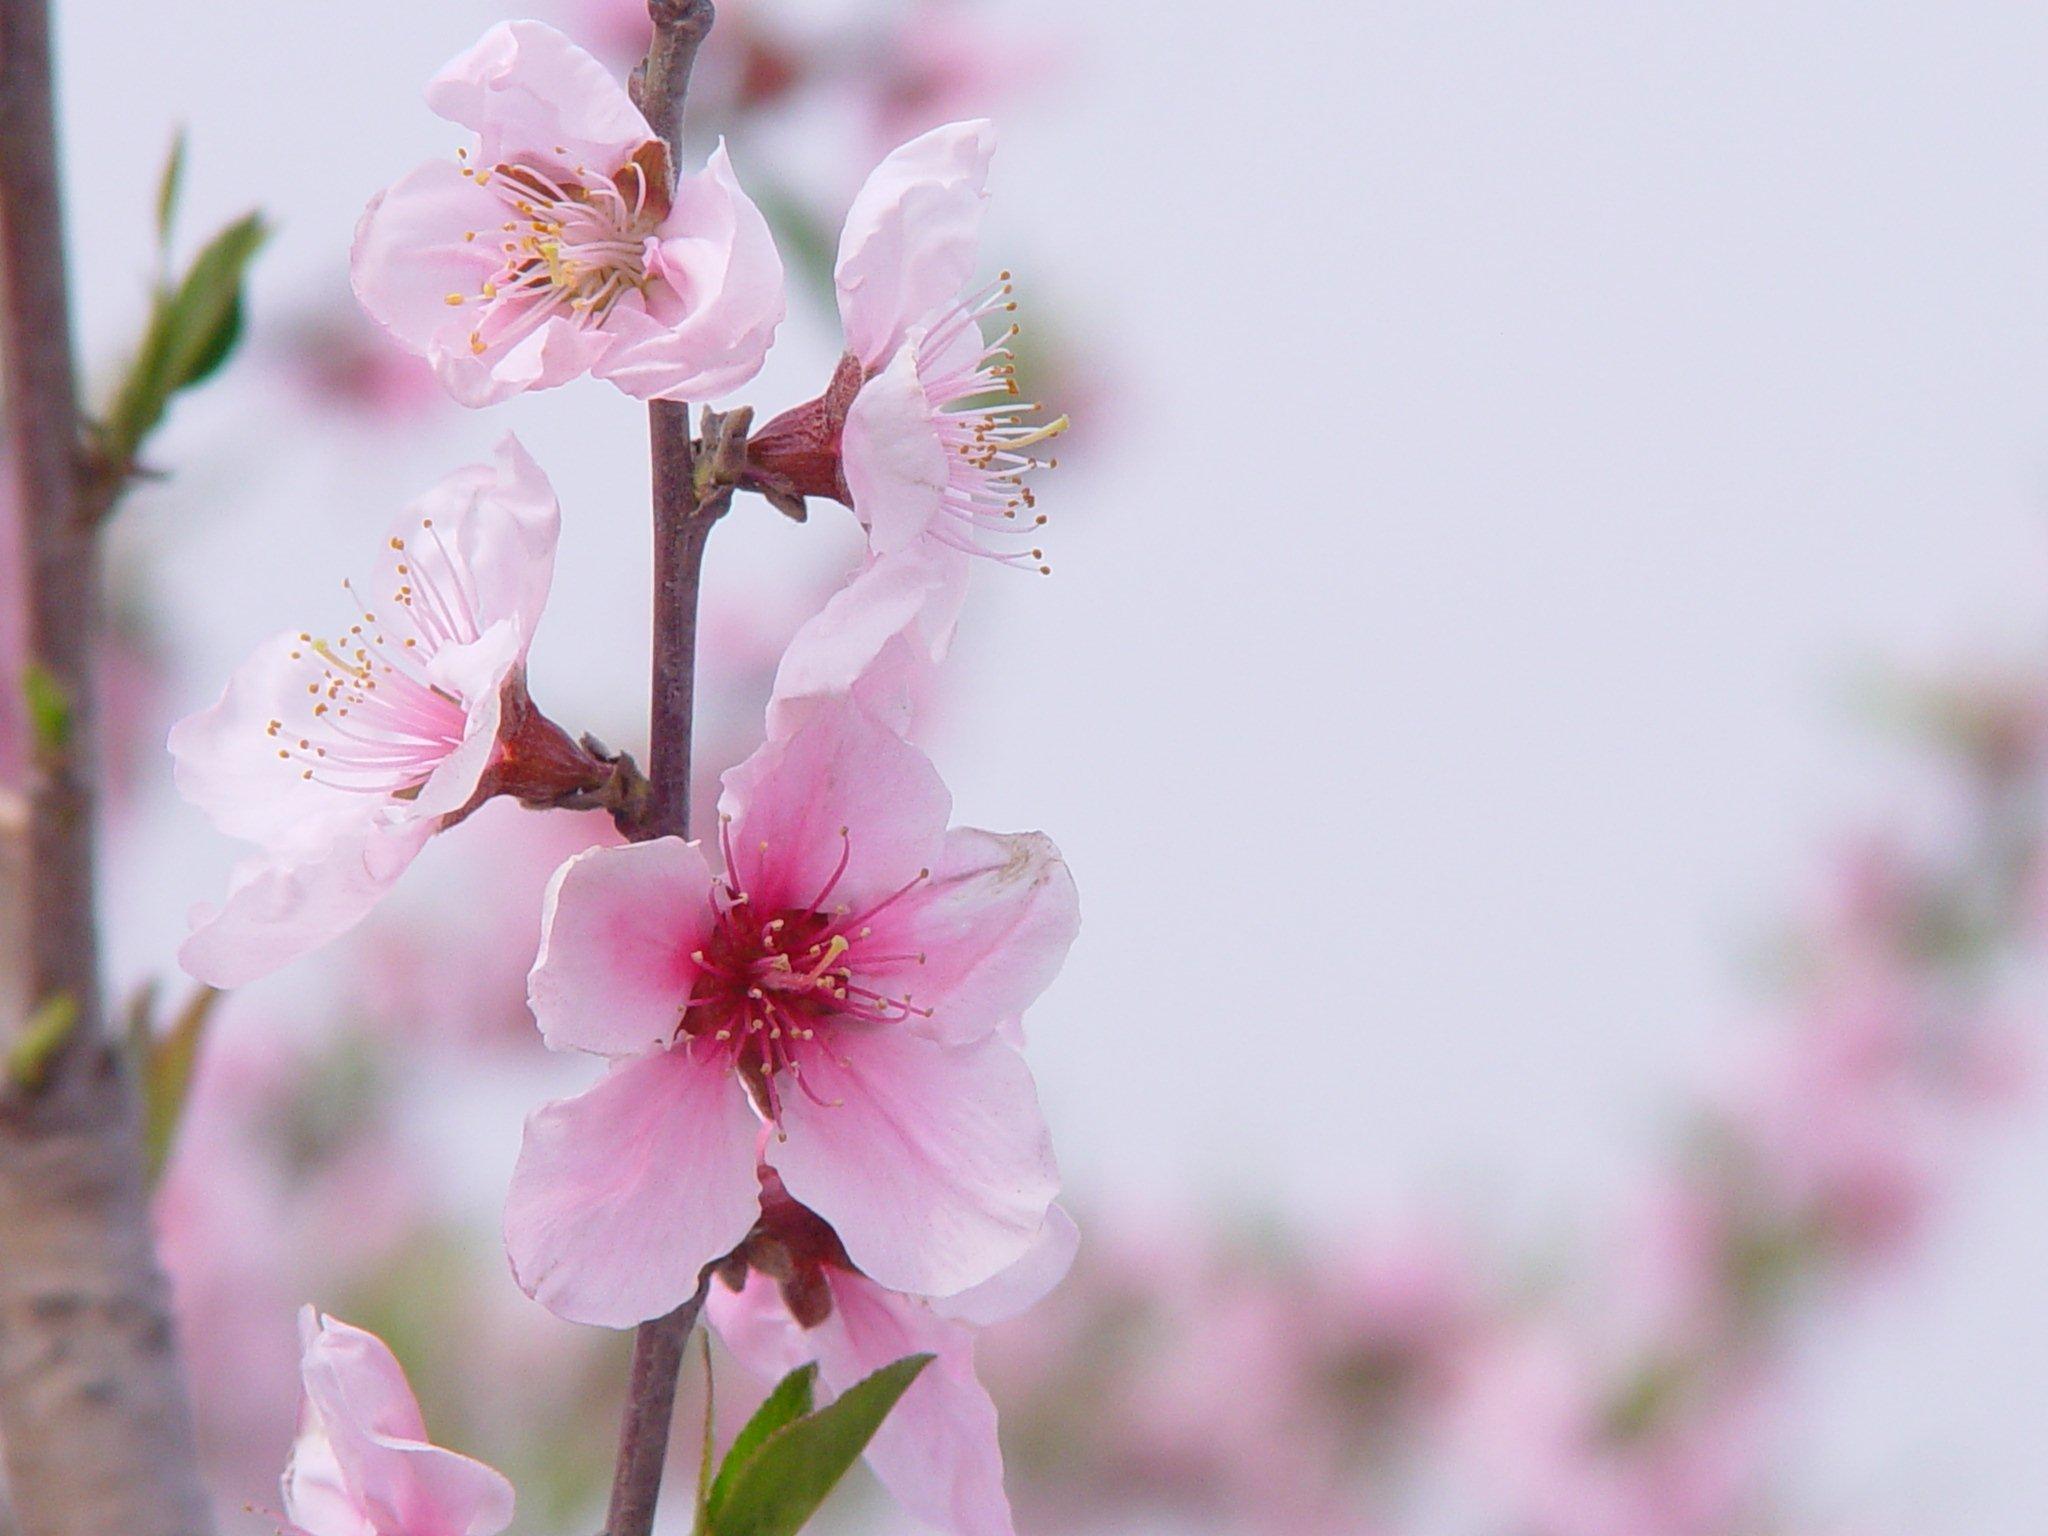 Flowers karatasi la kupamba ukuta